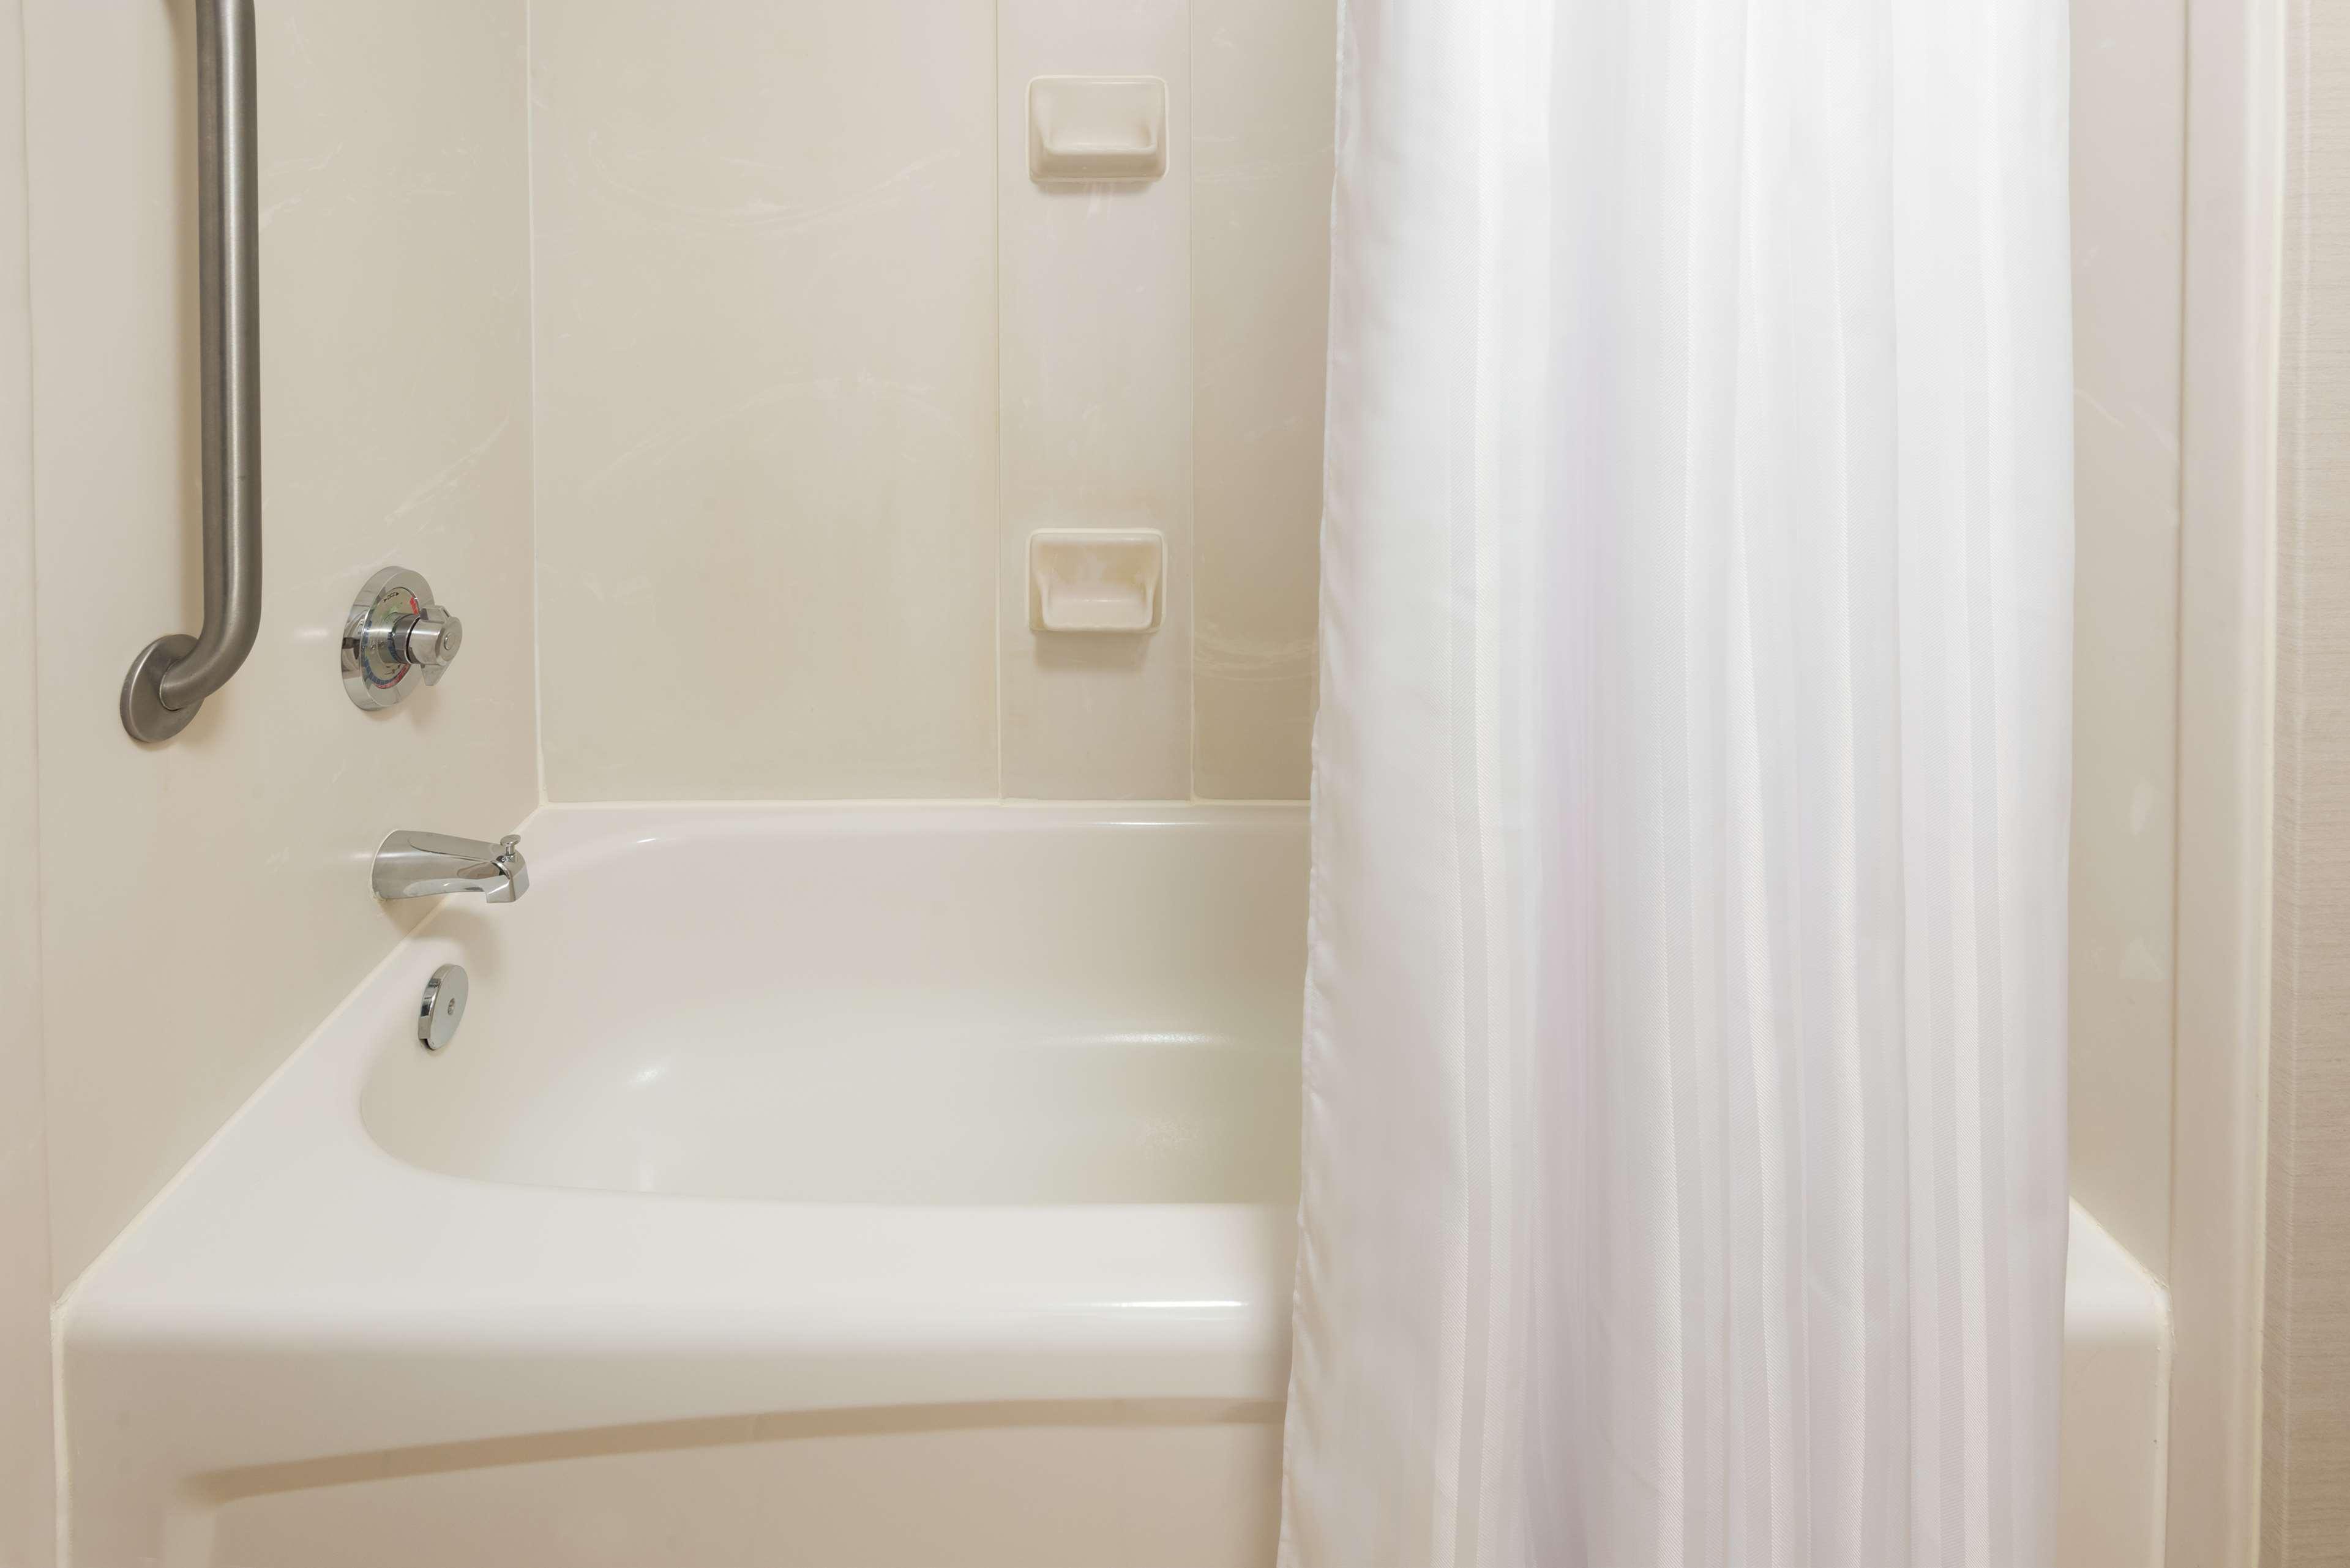 Homewood Suites by Hilton Orlando-UCF Area image 23